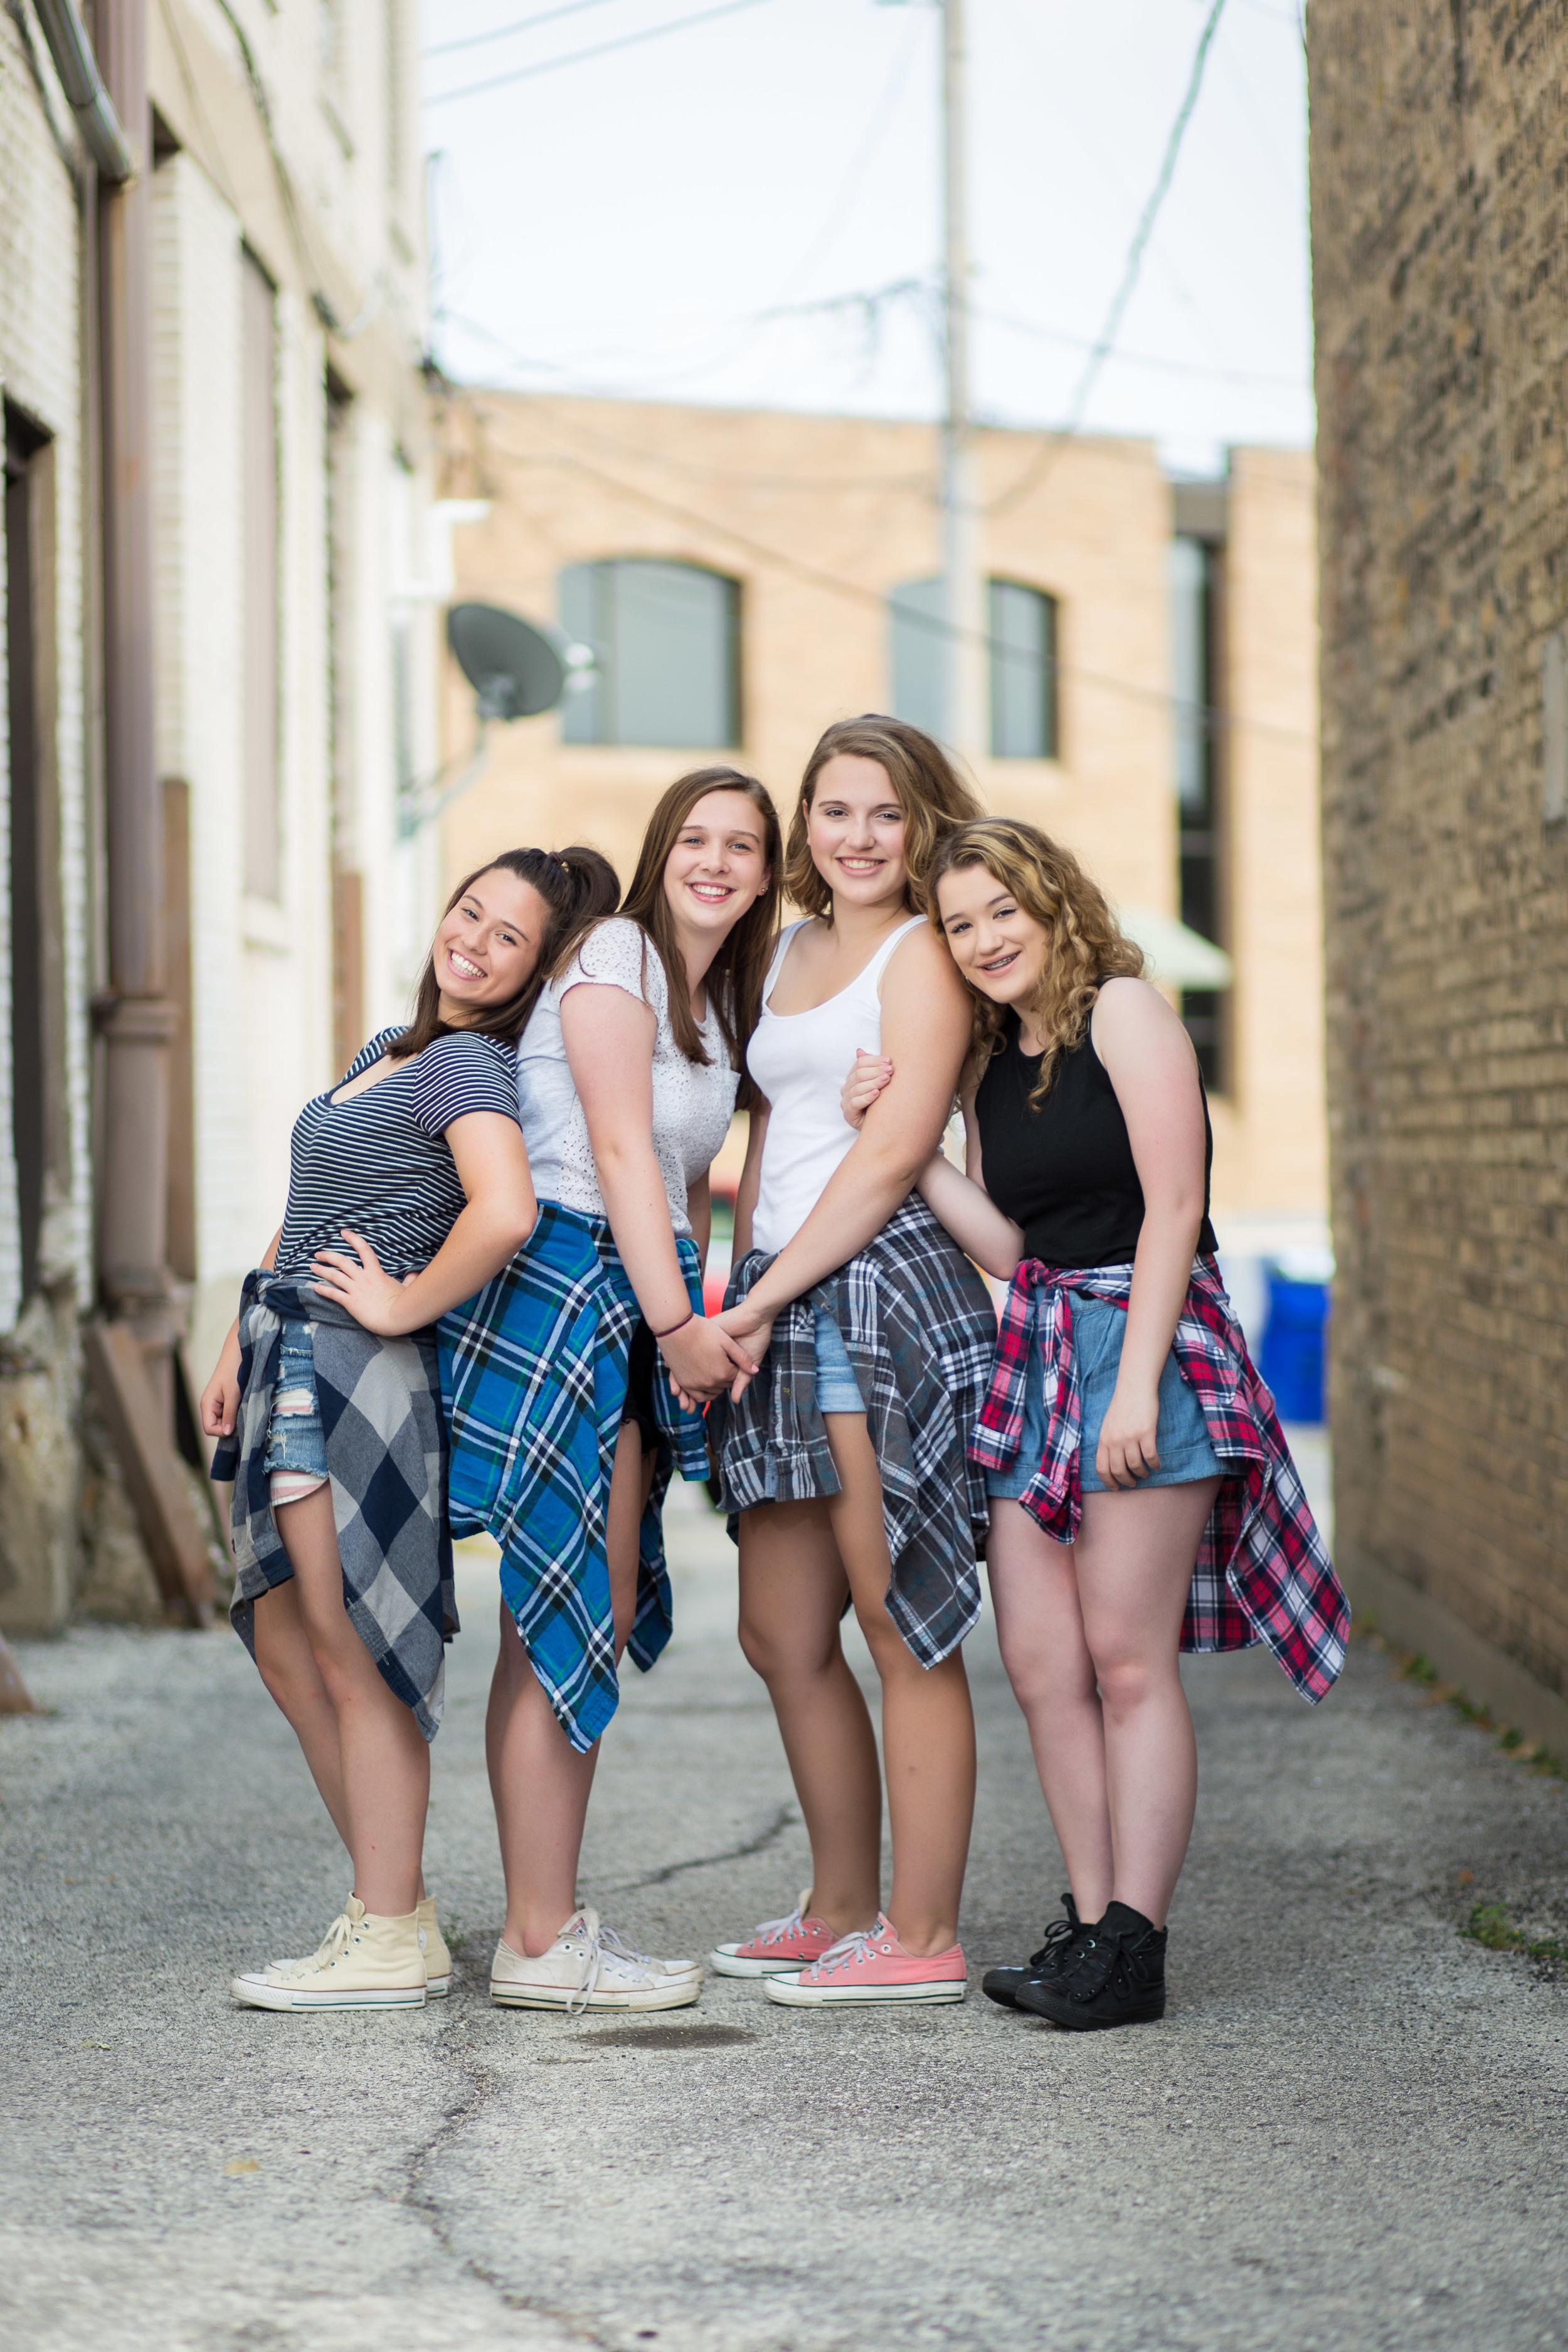 group tween portrait of four girls in alley